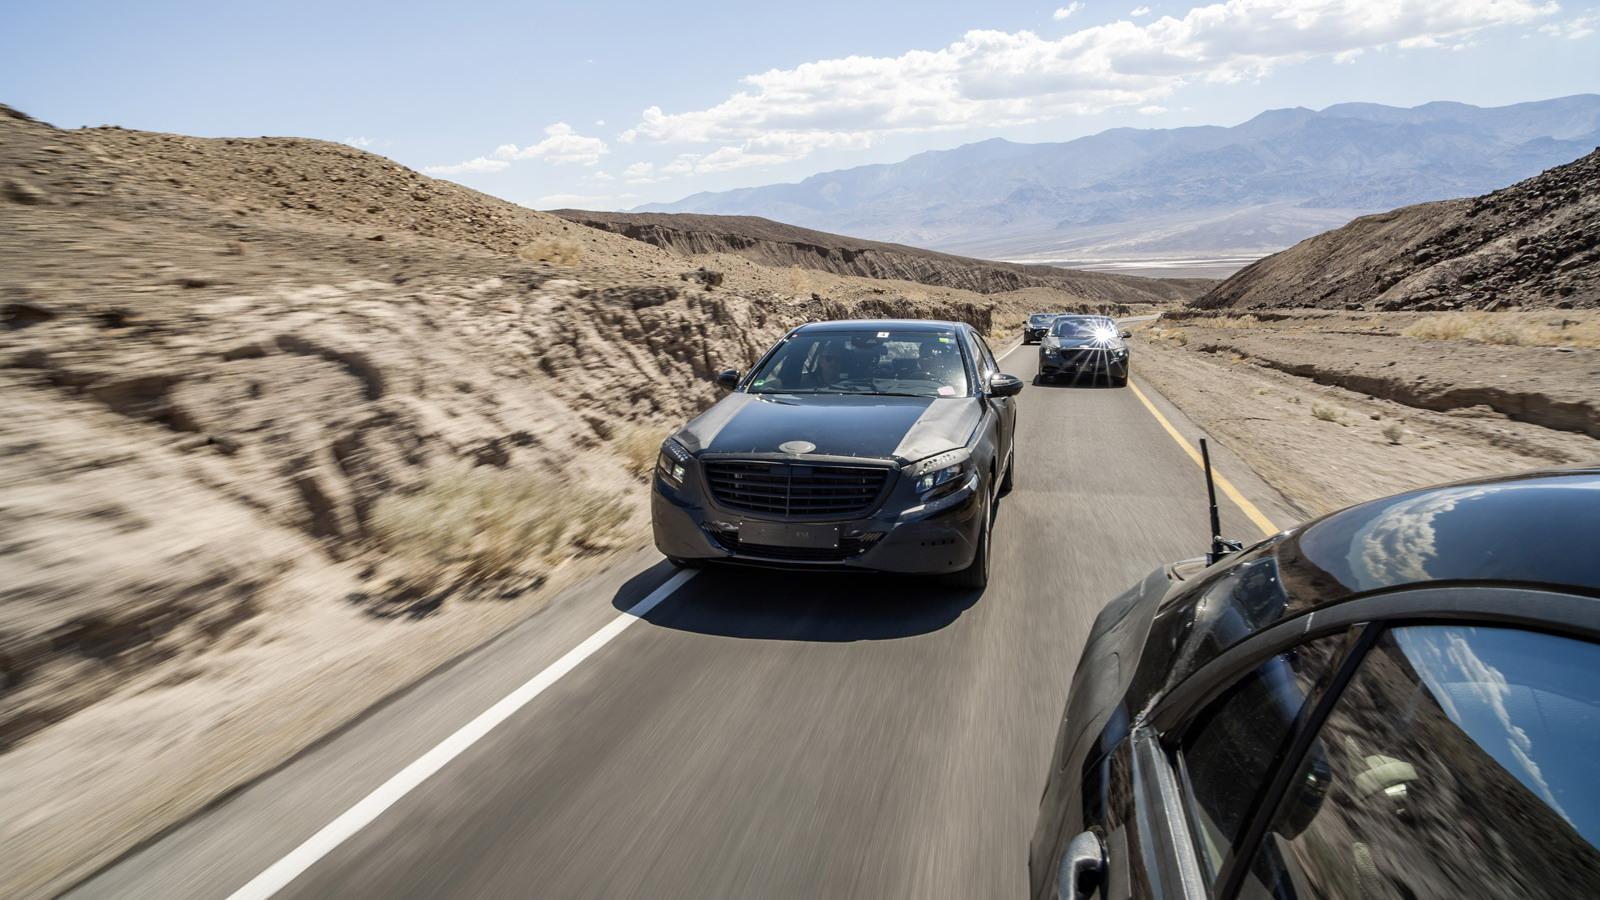 2014 Mercedes-Benz S Class autonomous steering testing